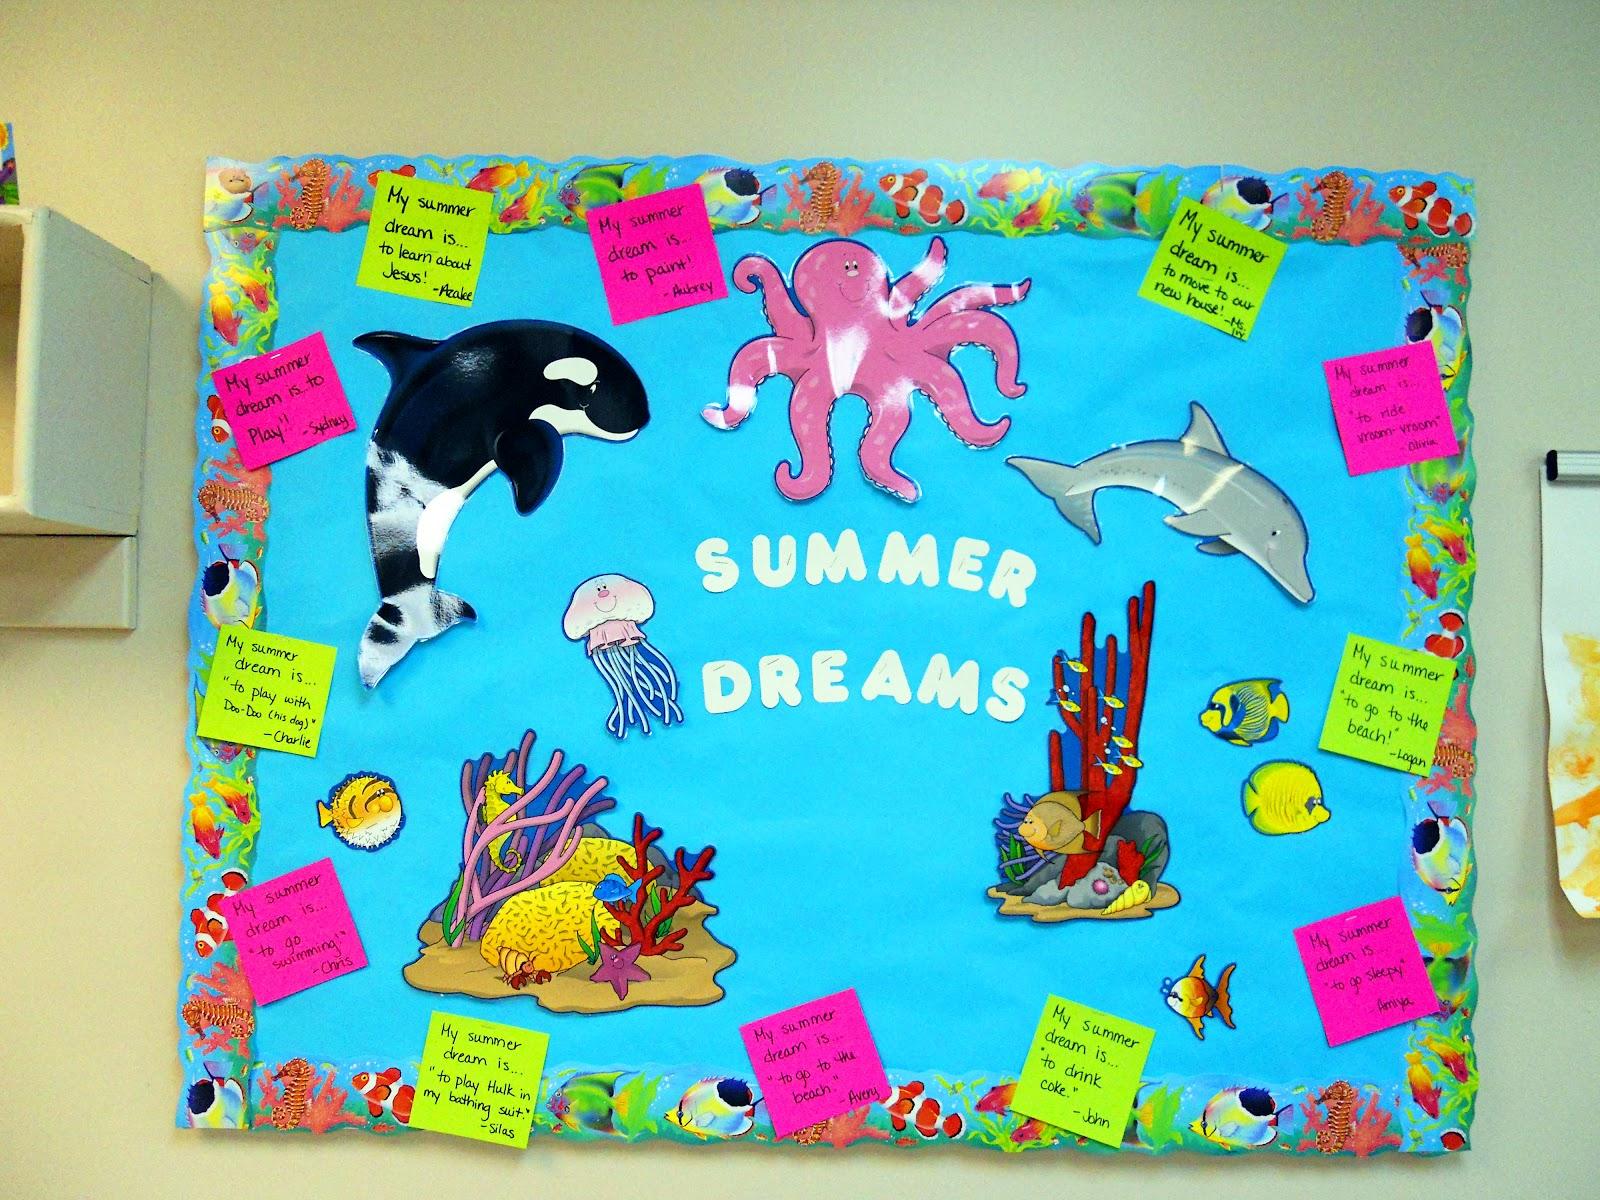 A walk in my shoes summer dreams bulletin board idea for Decoration board